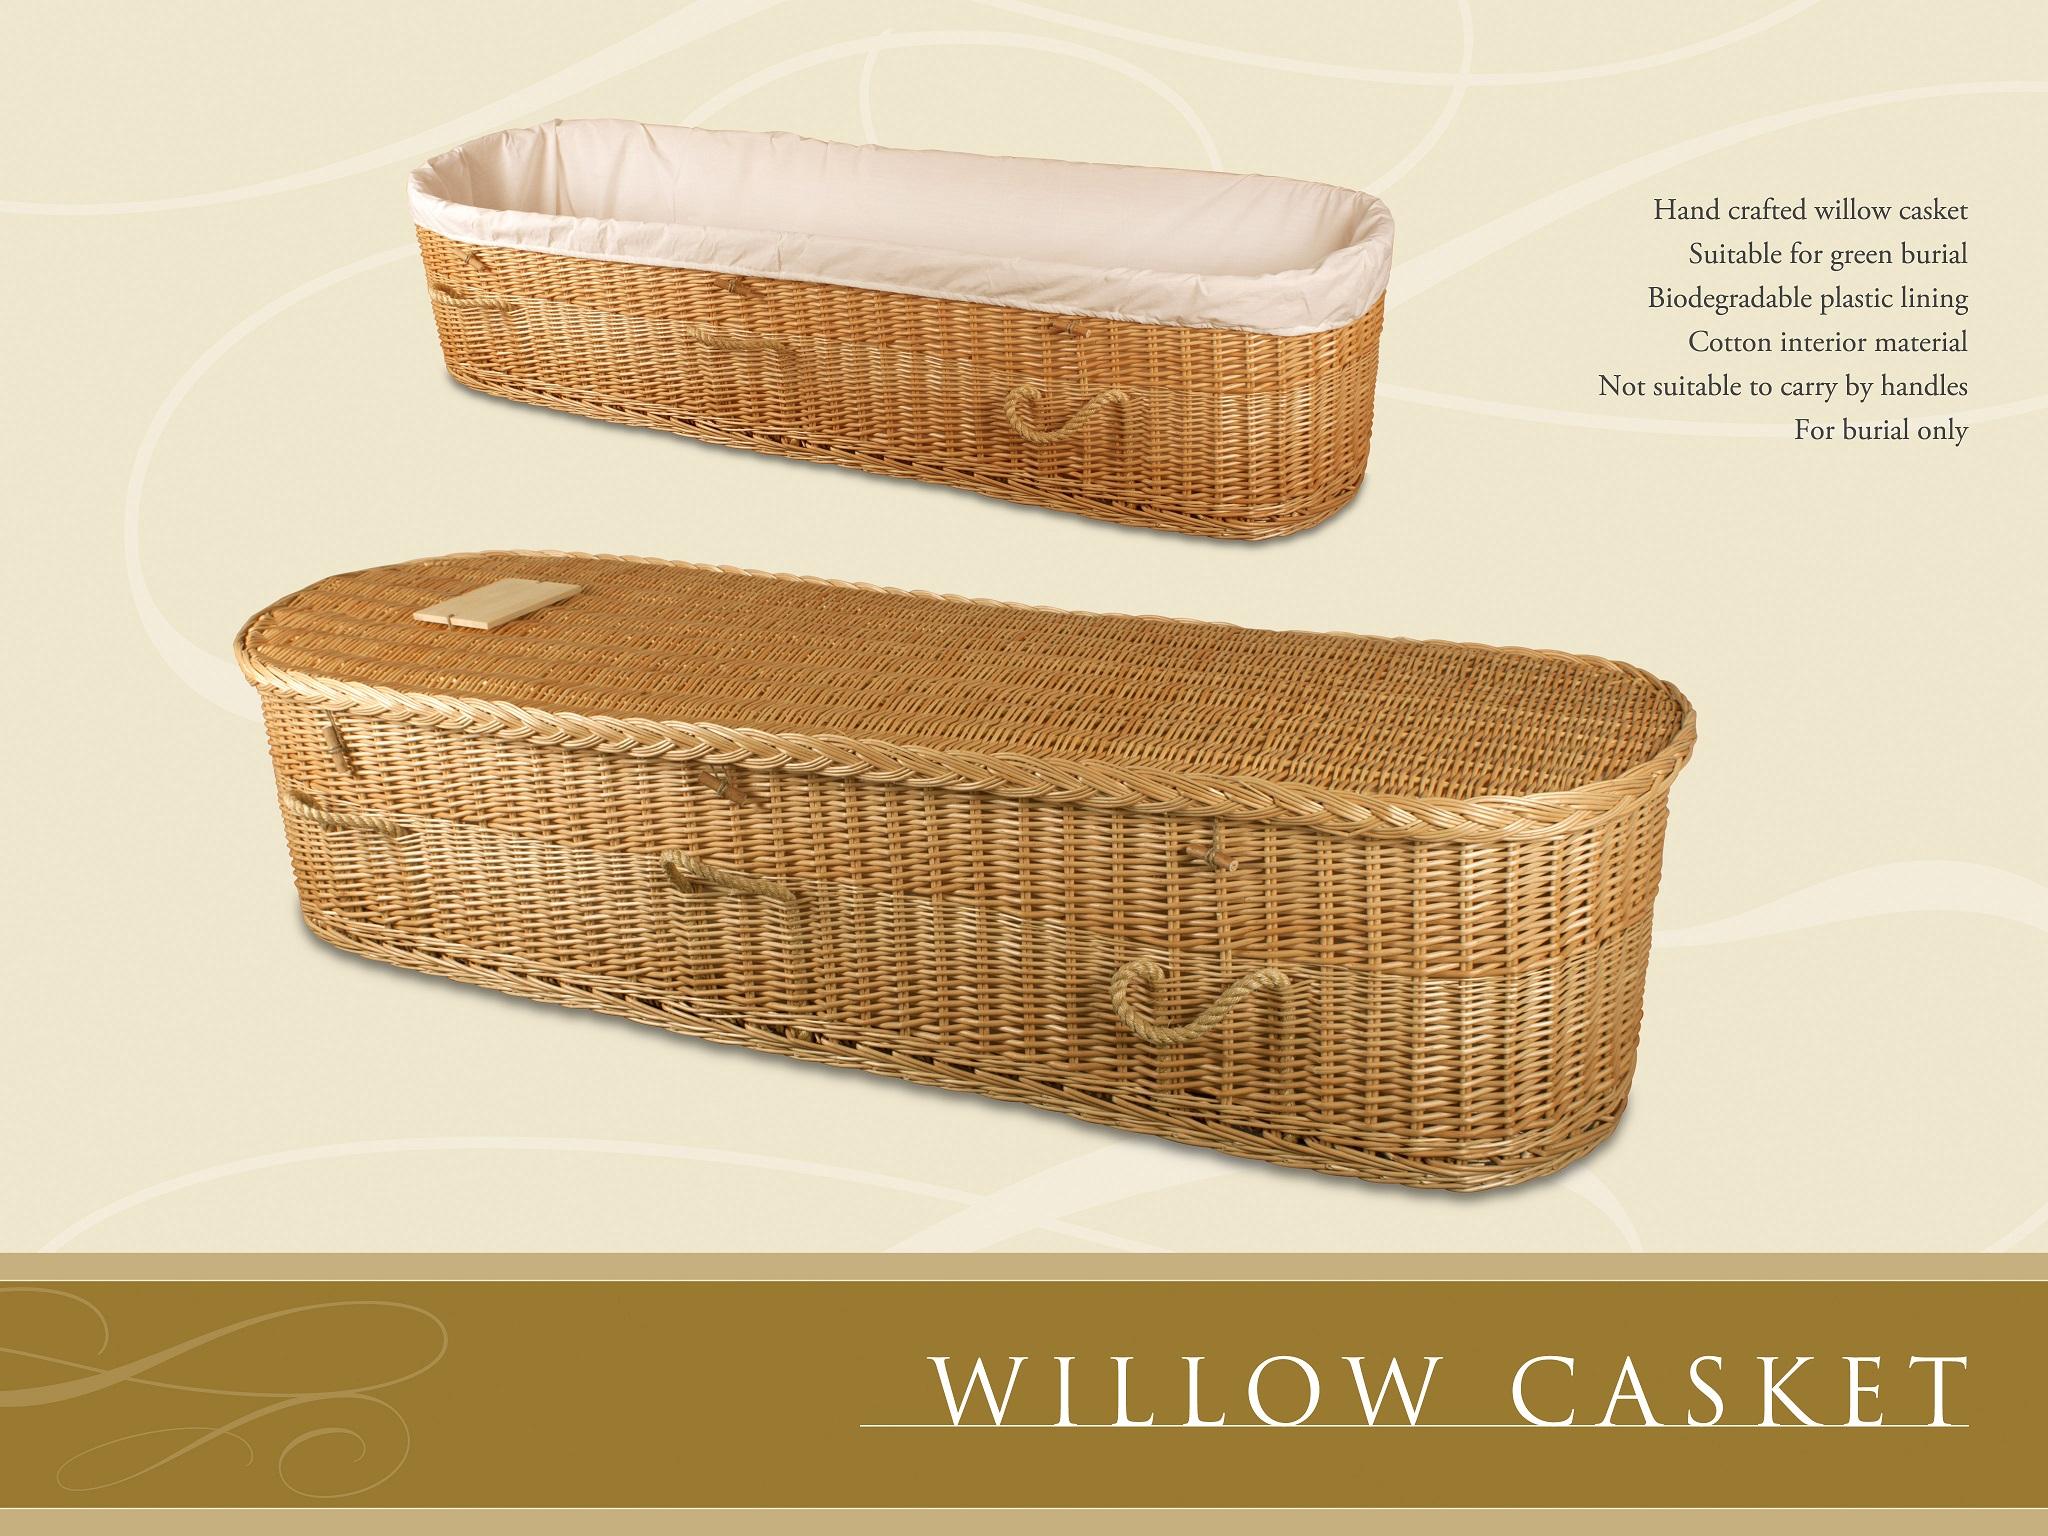 Willow Casket